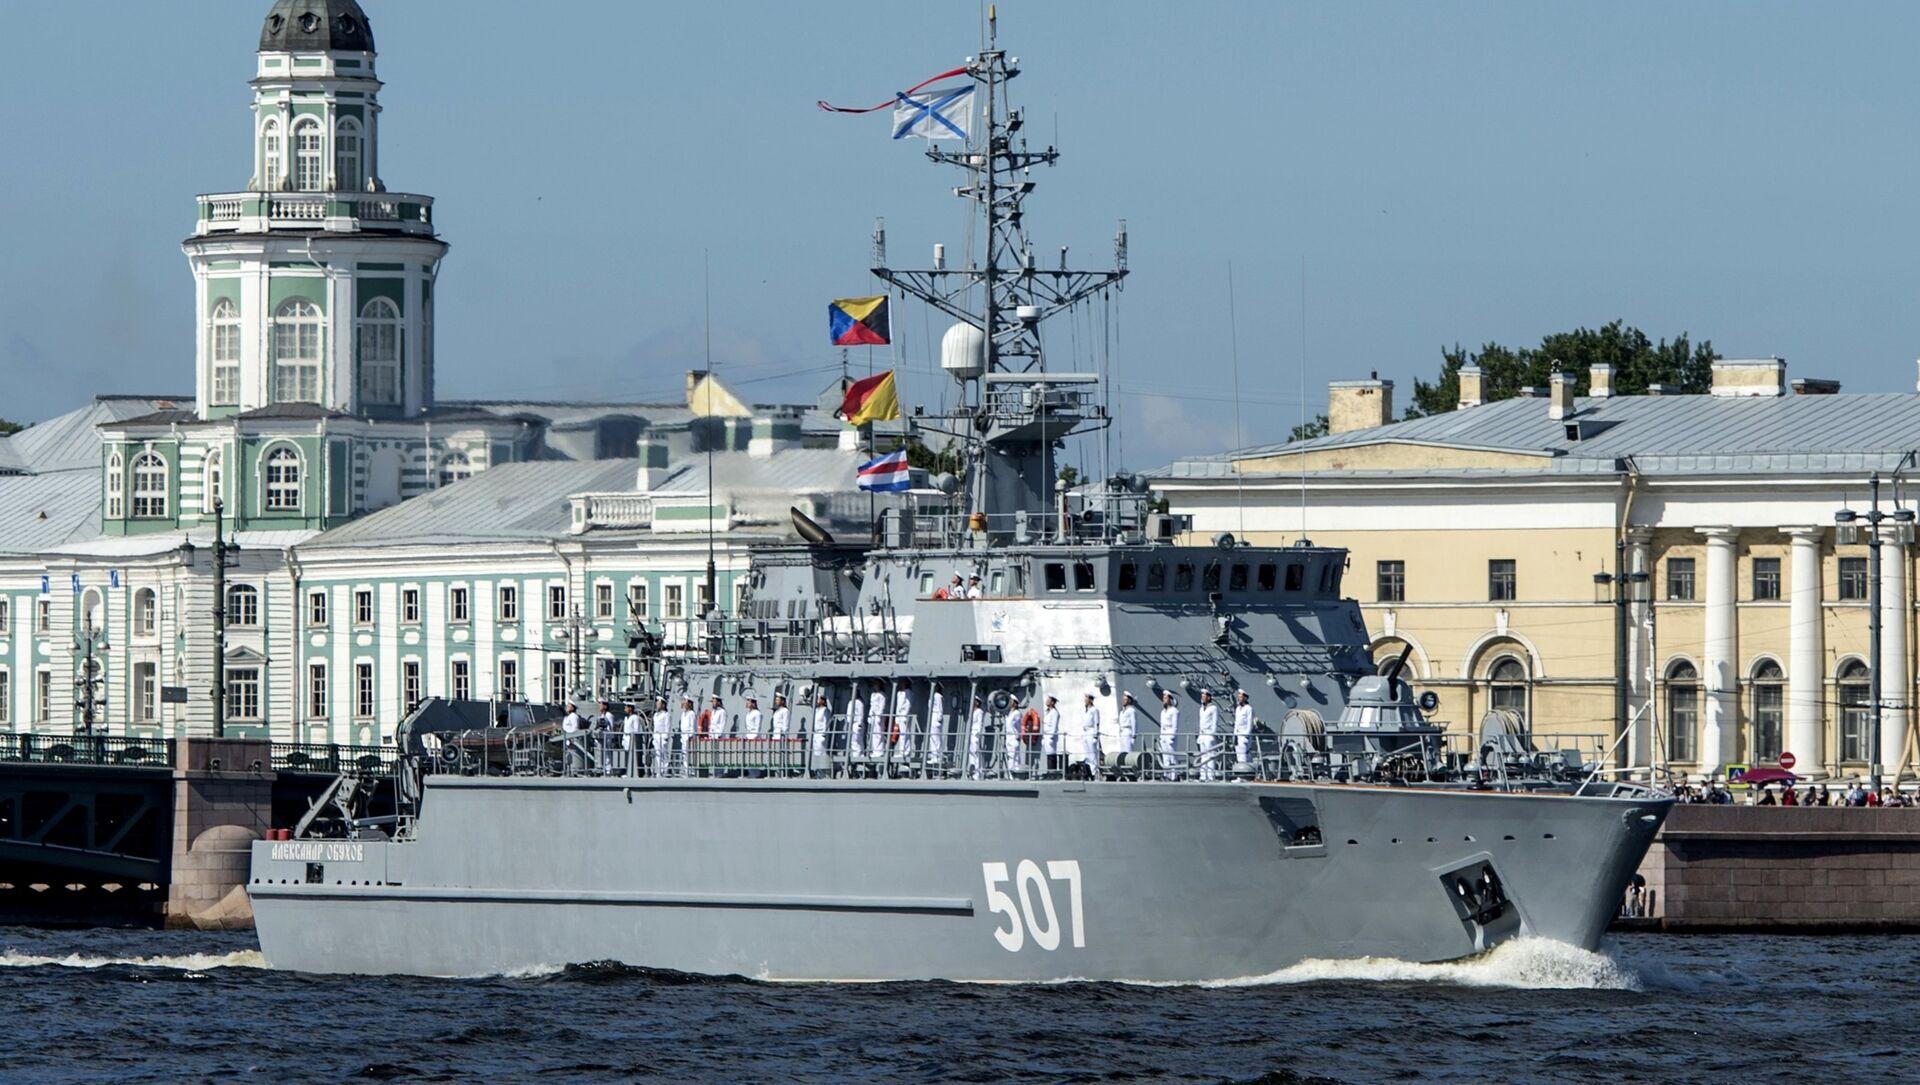 Rehearsal of Russian Navy Day parade in St. Petersburg - Sputnik International, 1920, 25.07.2021